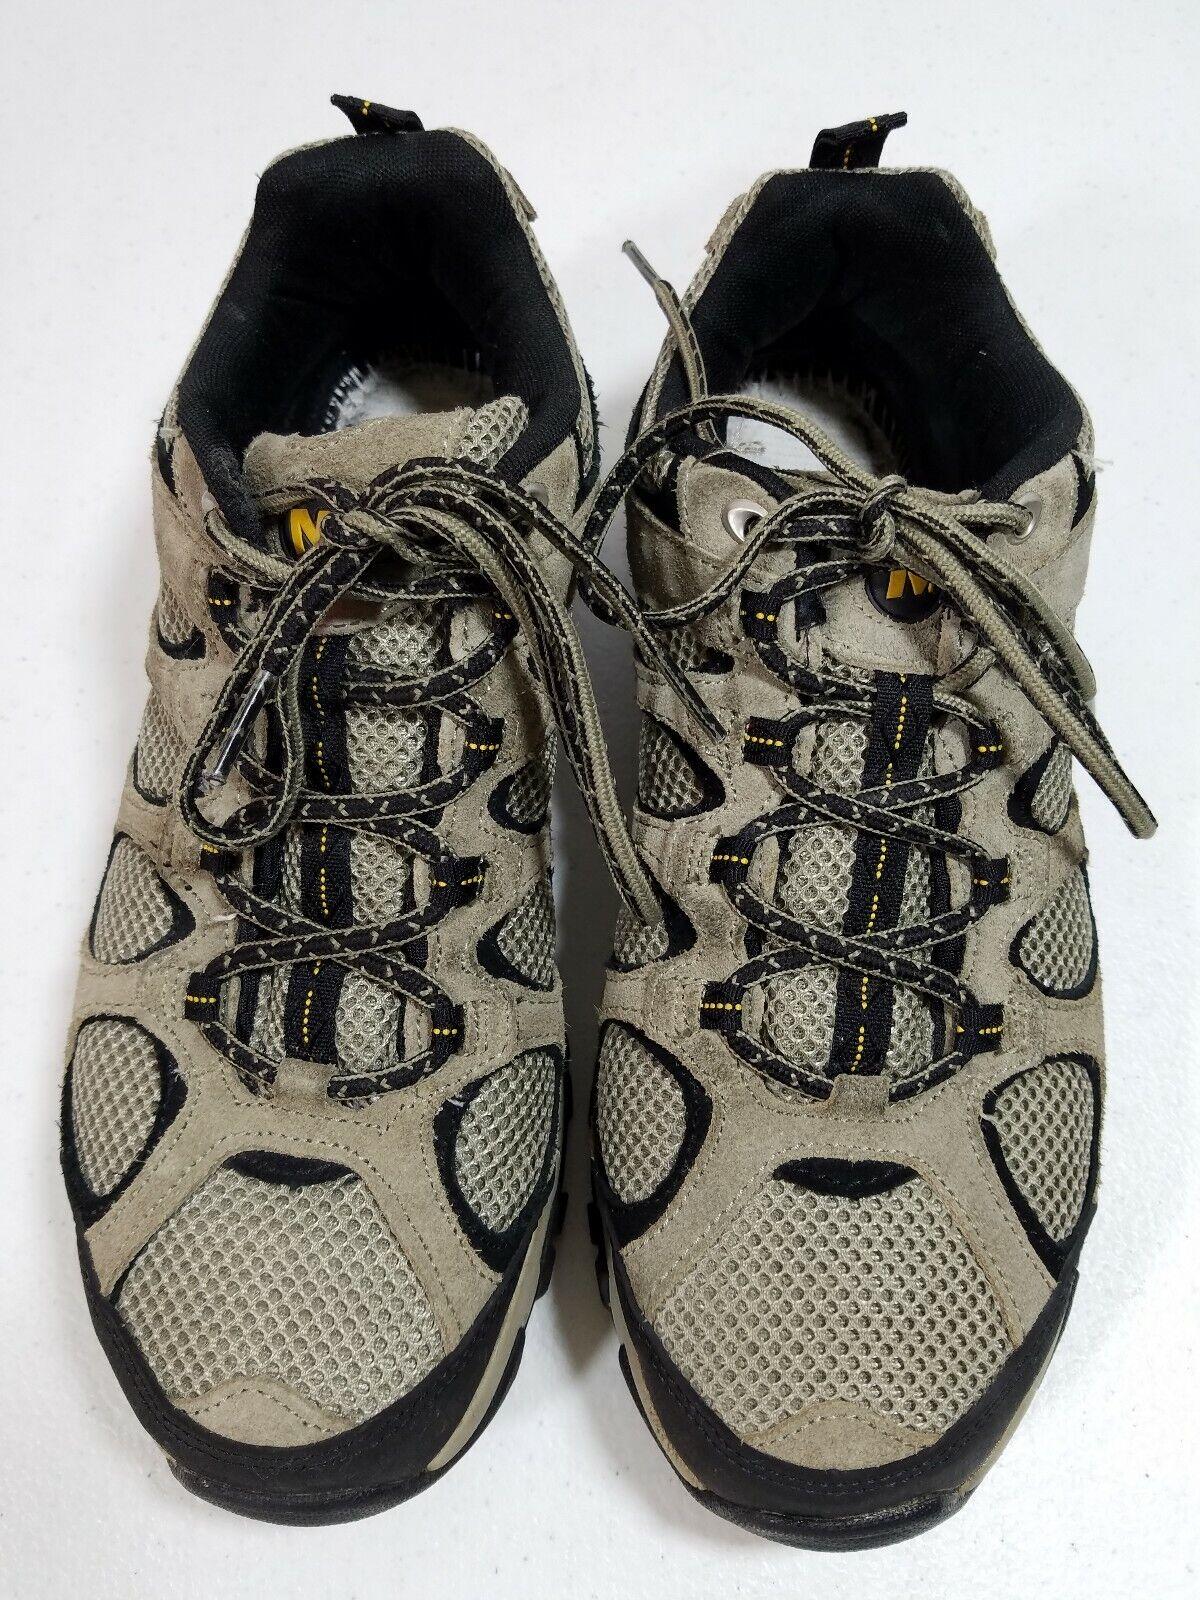 Merrell Hilltop Ventilator Mens Brown Hiking shoes Size 8